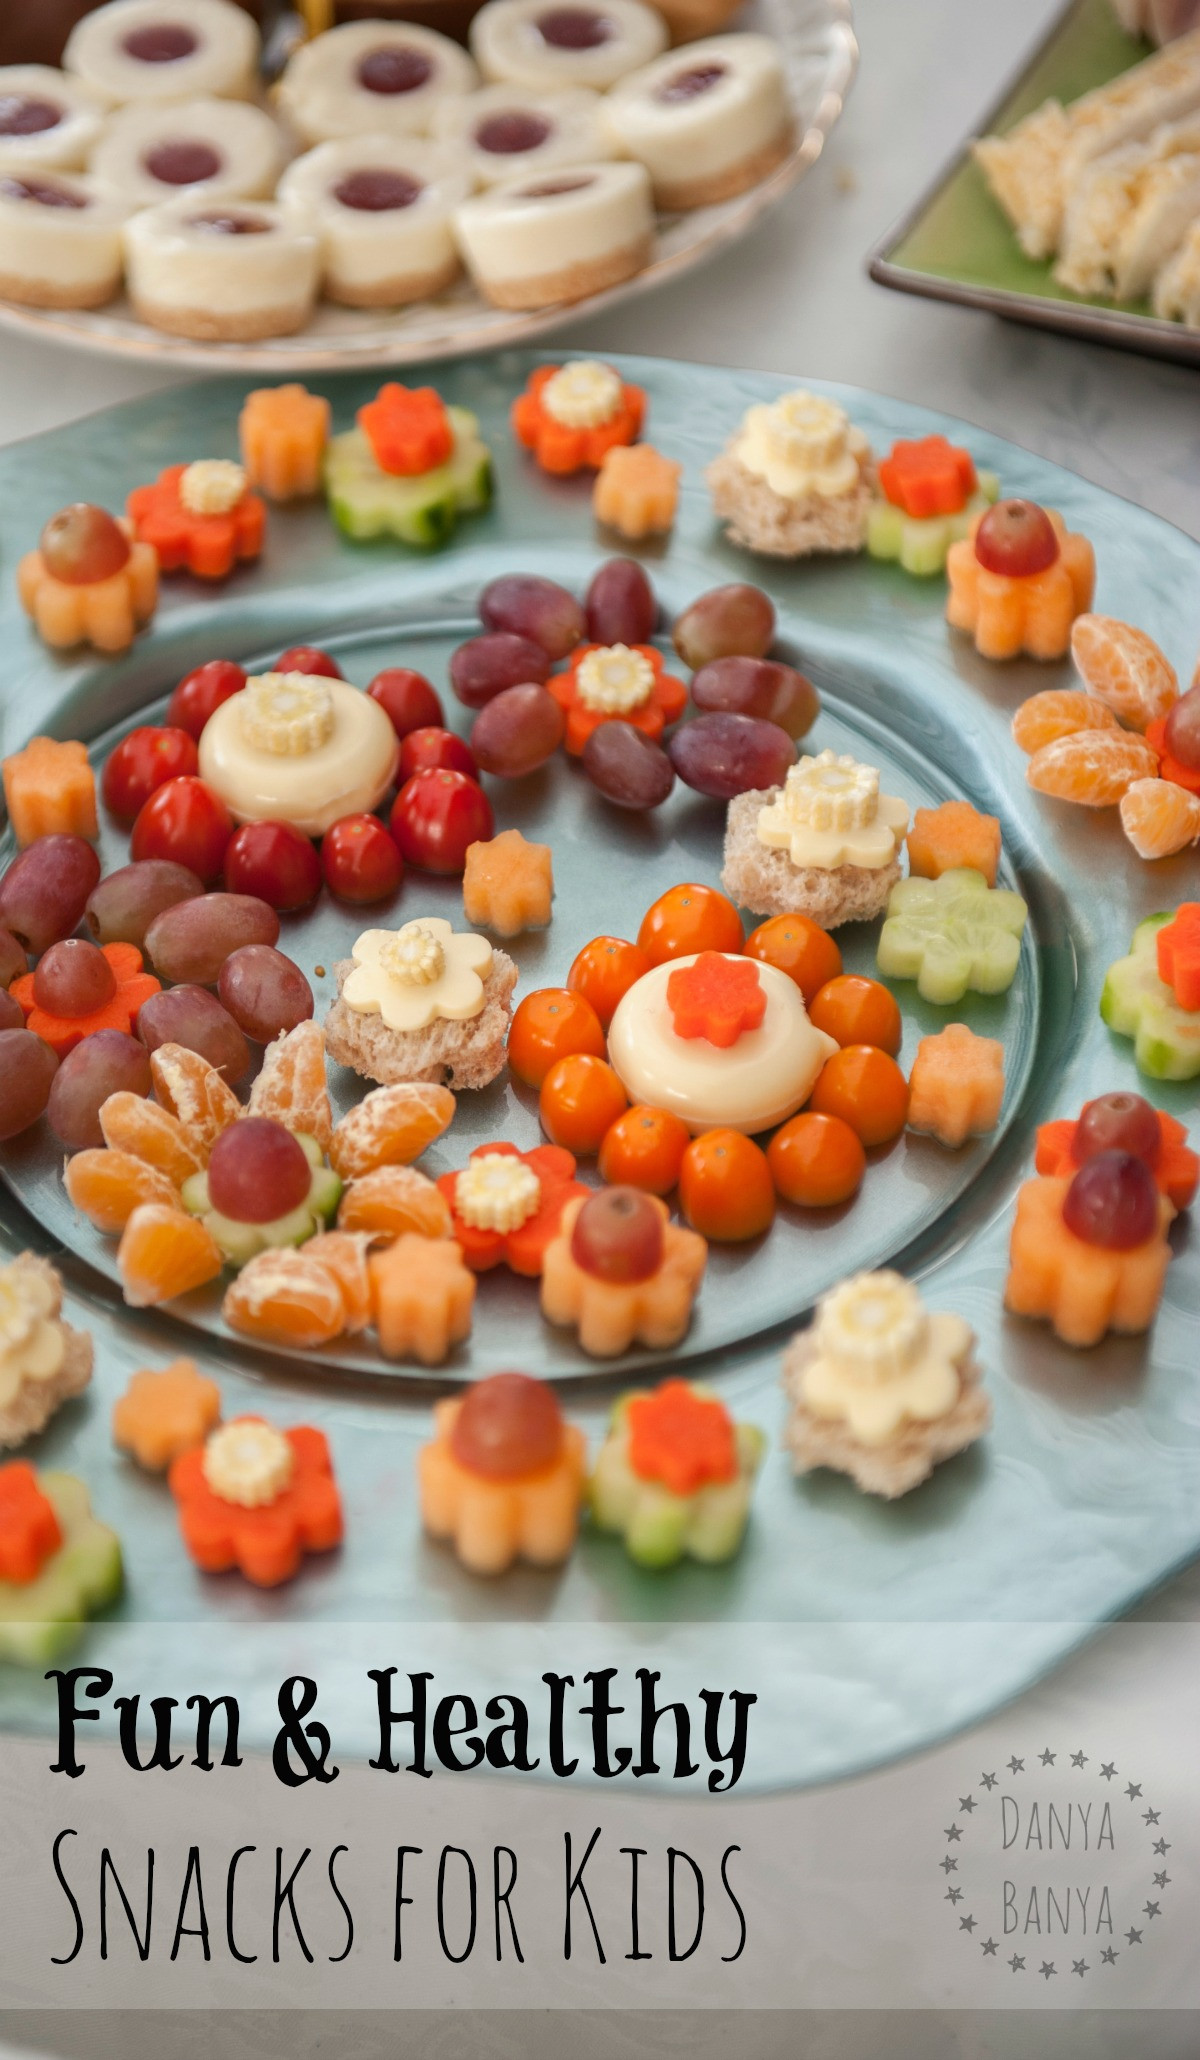 Good Healthy Snacks For Kids  Fun & Healthy Snacks for Kids – Danya Banya